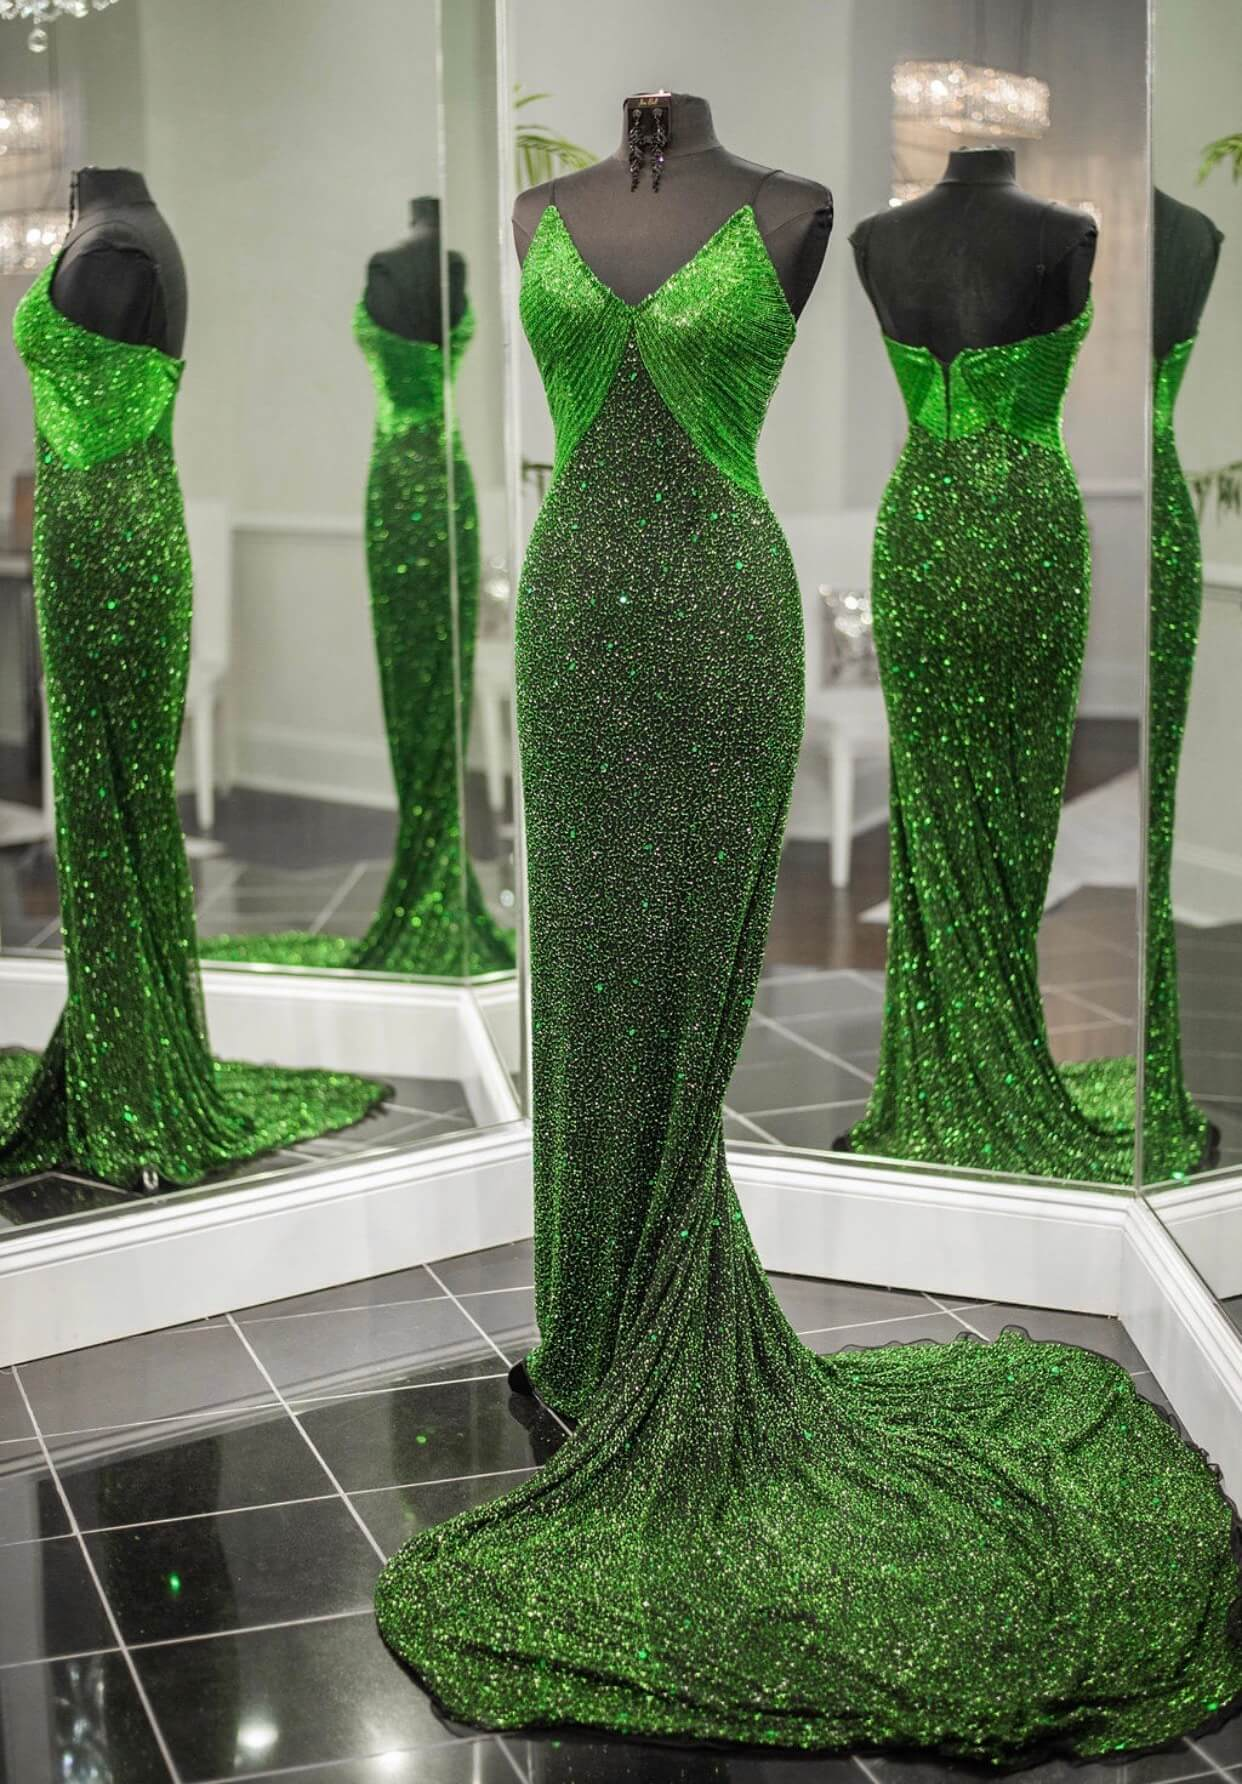 Ashley Lauren Green Size 4 Pageant Train Custom Mermaid Dress on Queenly